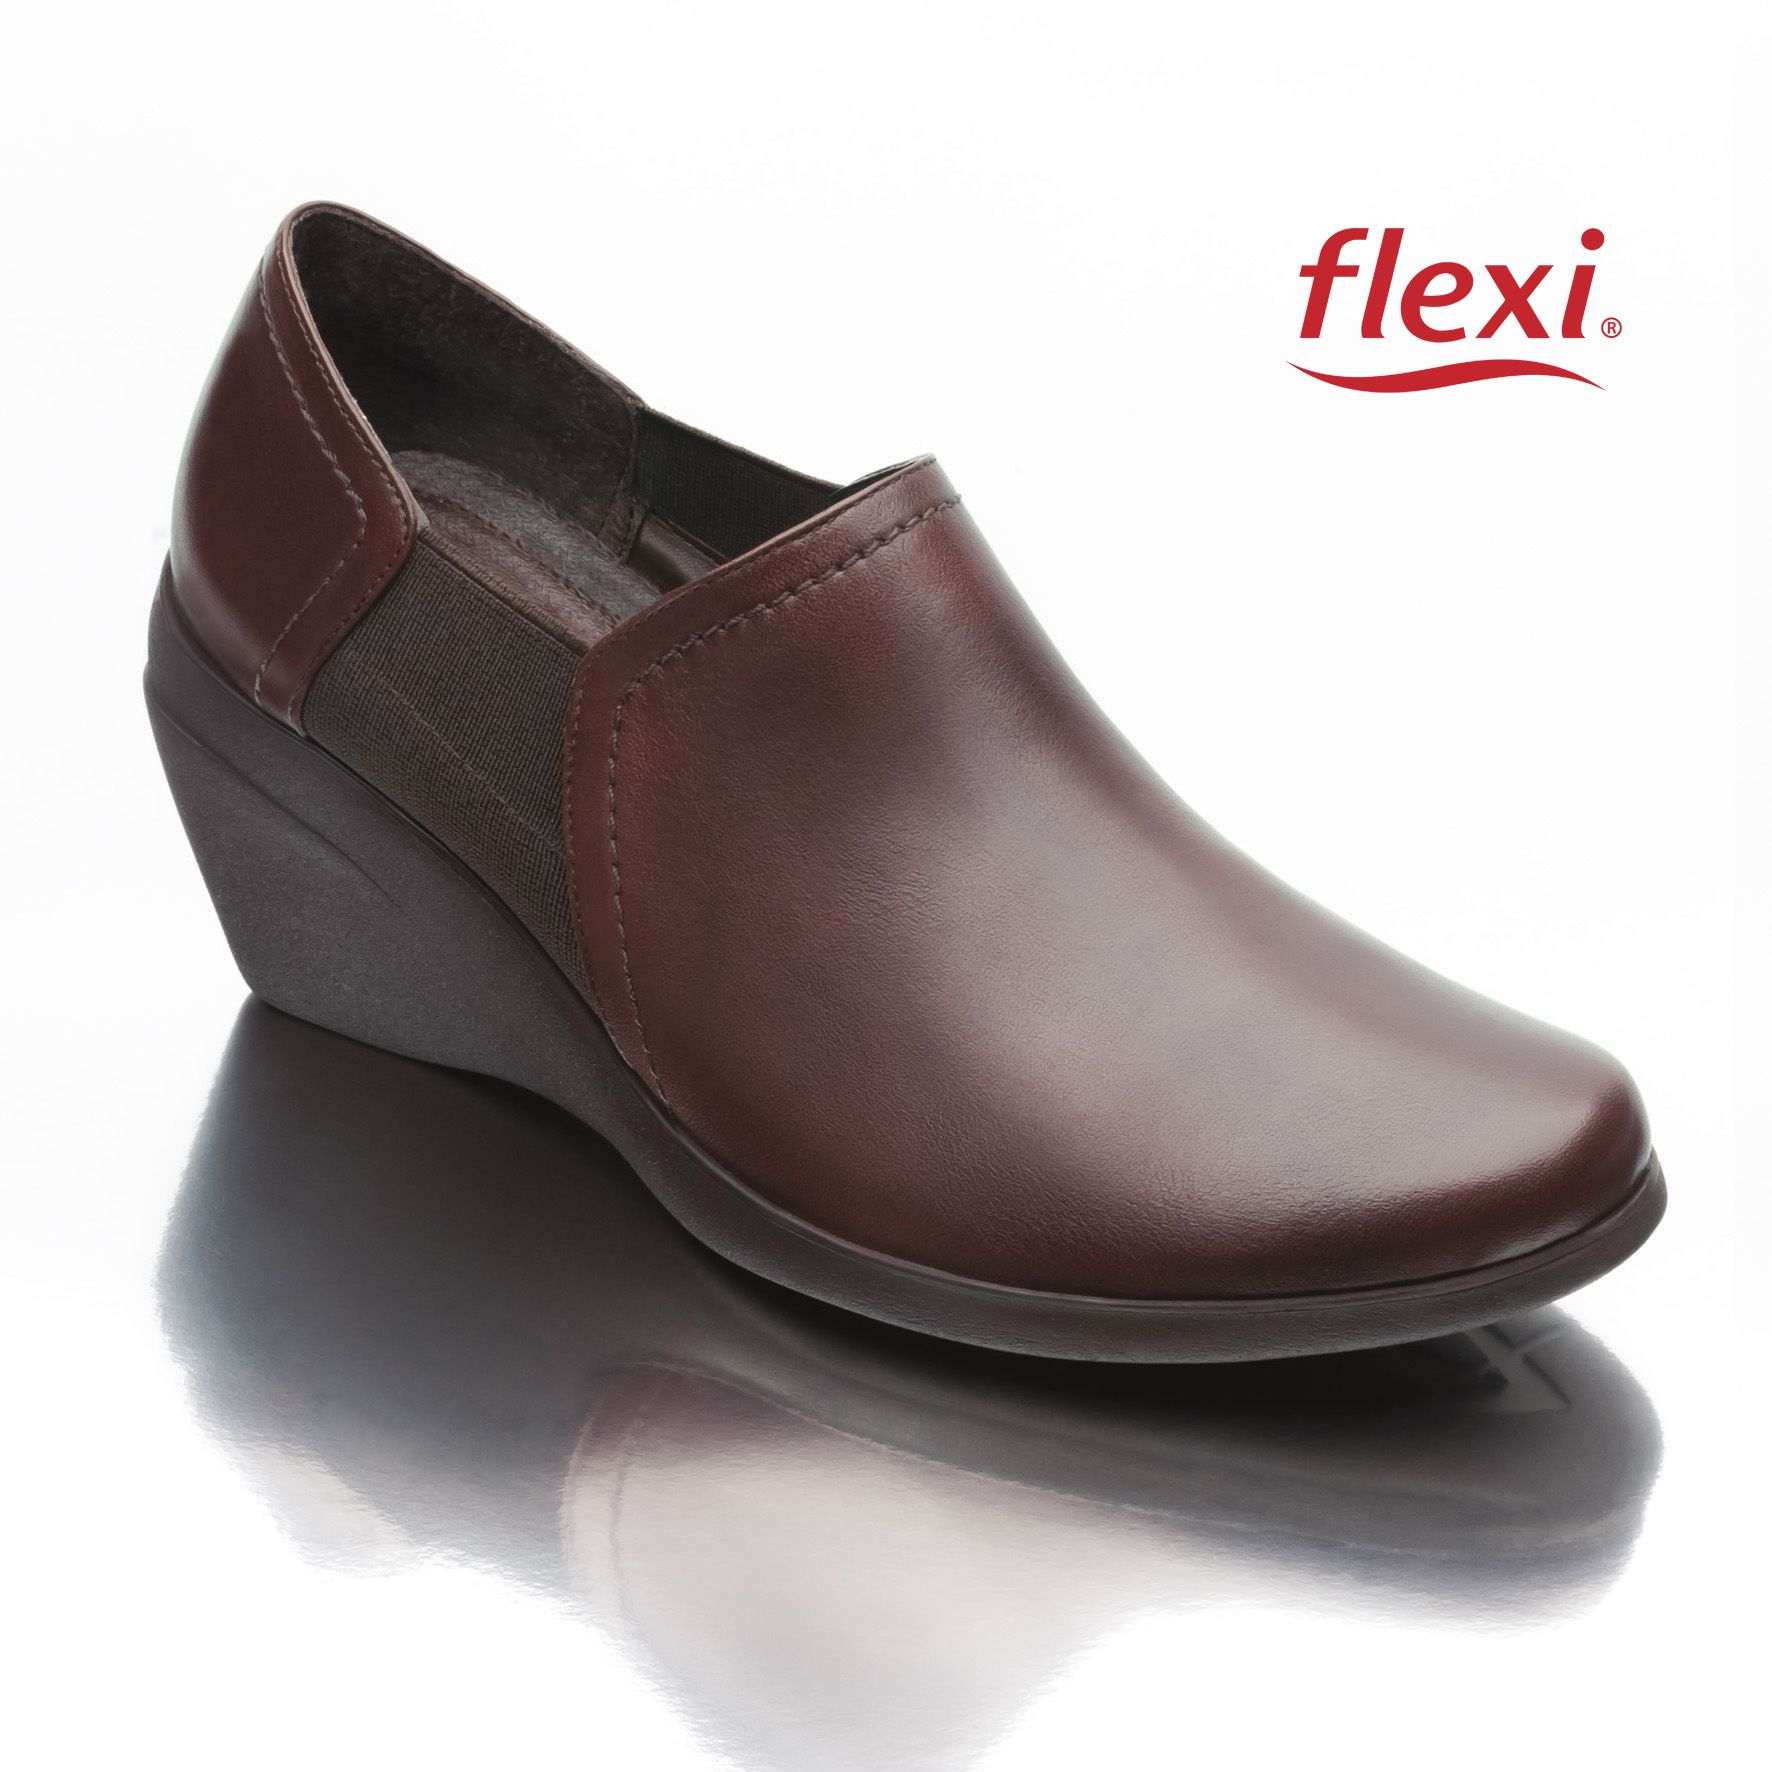 842afcc2 19402 MARRON #shoes #zapatos #fashion #moda #goflexi #flexi #clothes #style  #estilo #otono #invierno #autumn #winter